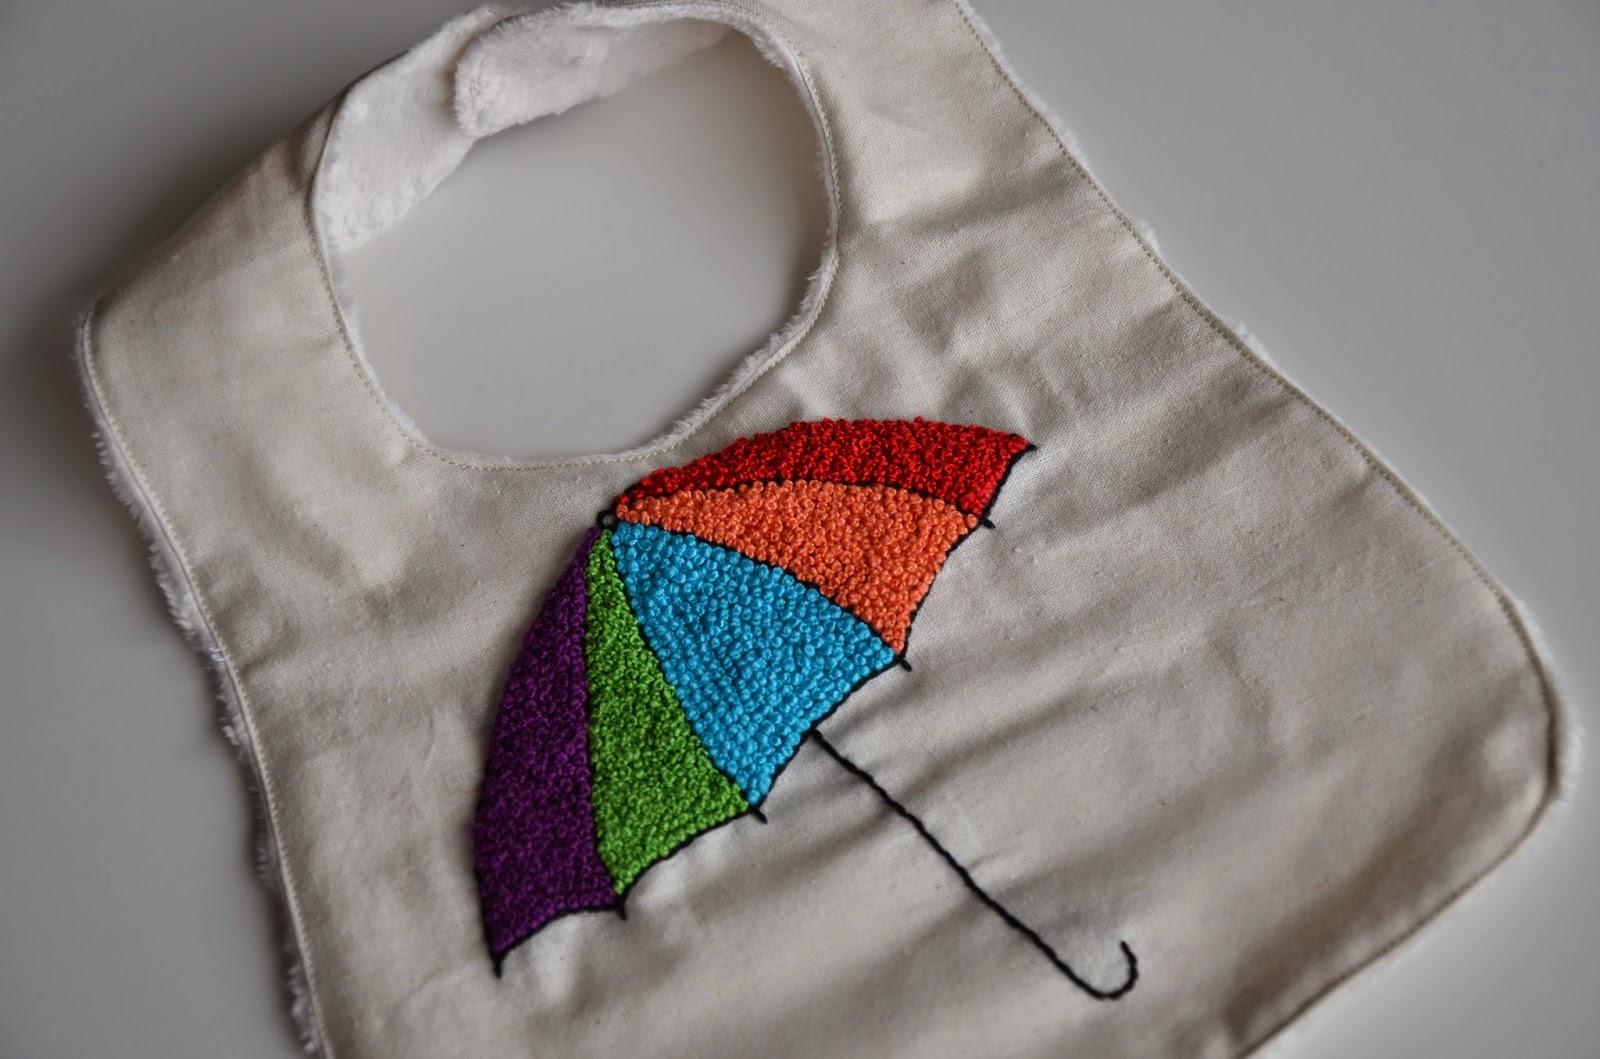 A colourful bib by MADE BY Y